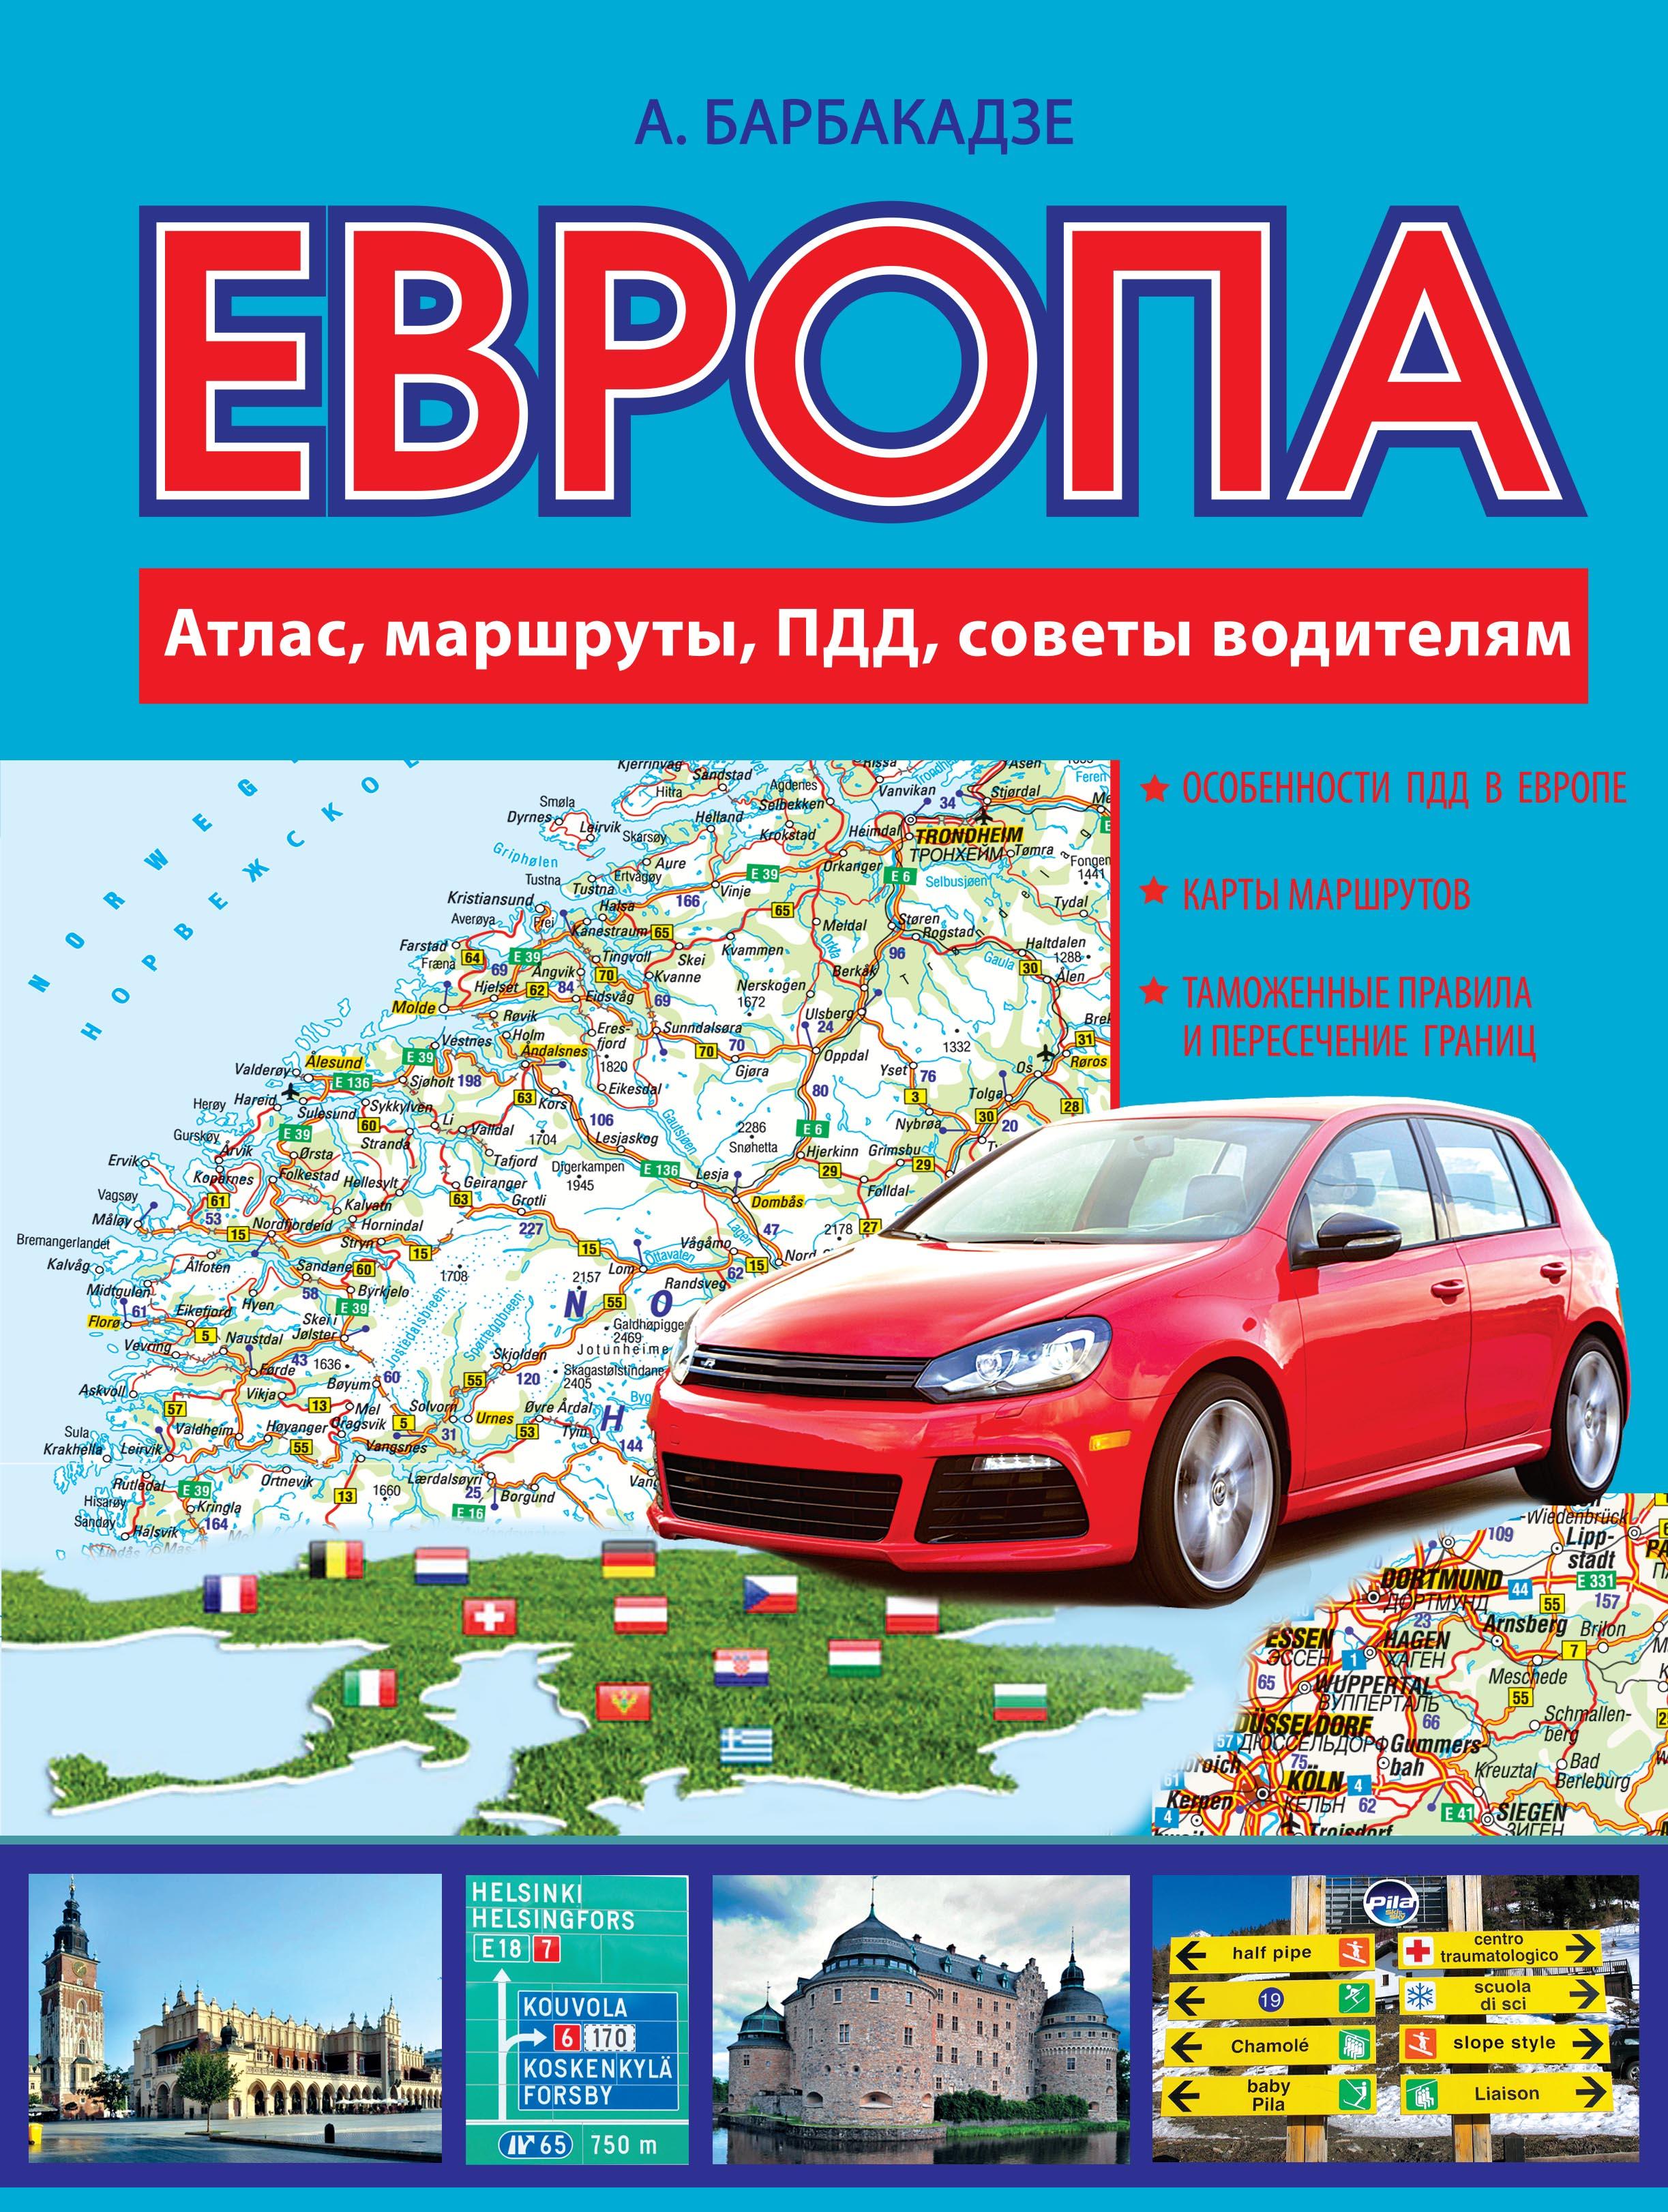 Европа. Атлас, маршруты, ПДД, советы водителям. А. Барбакадзе